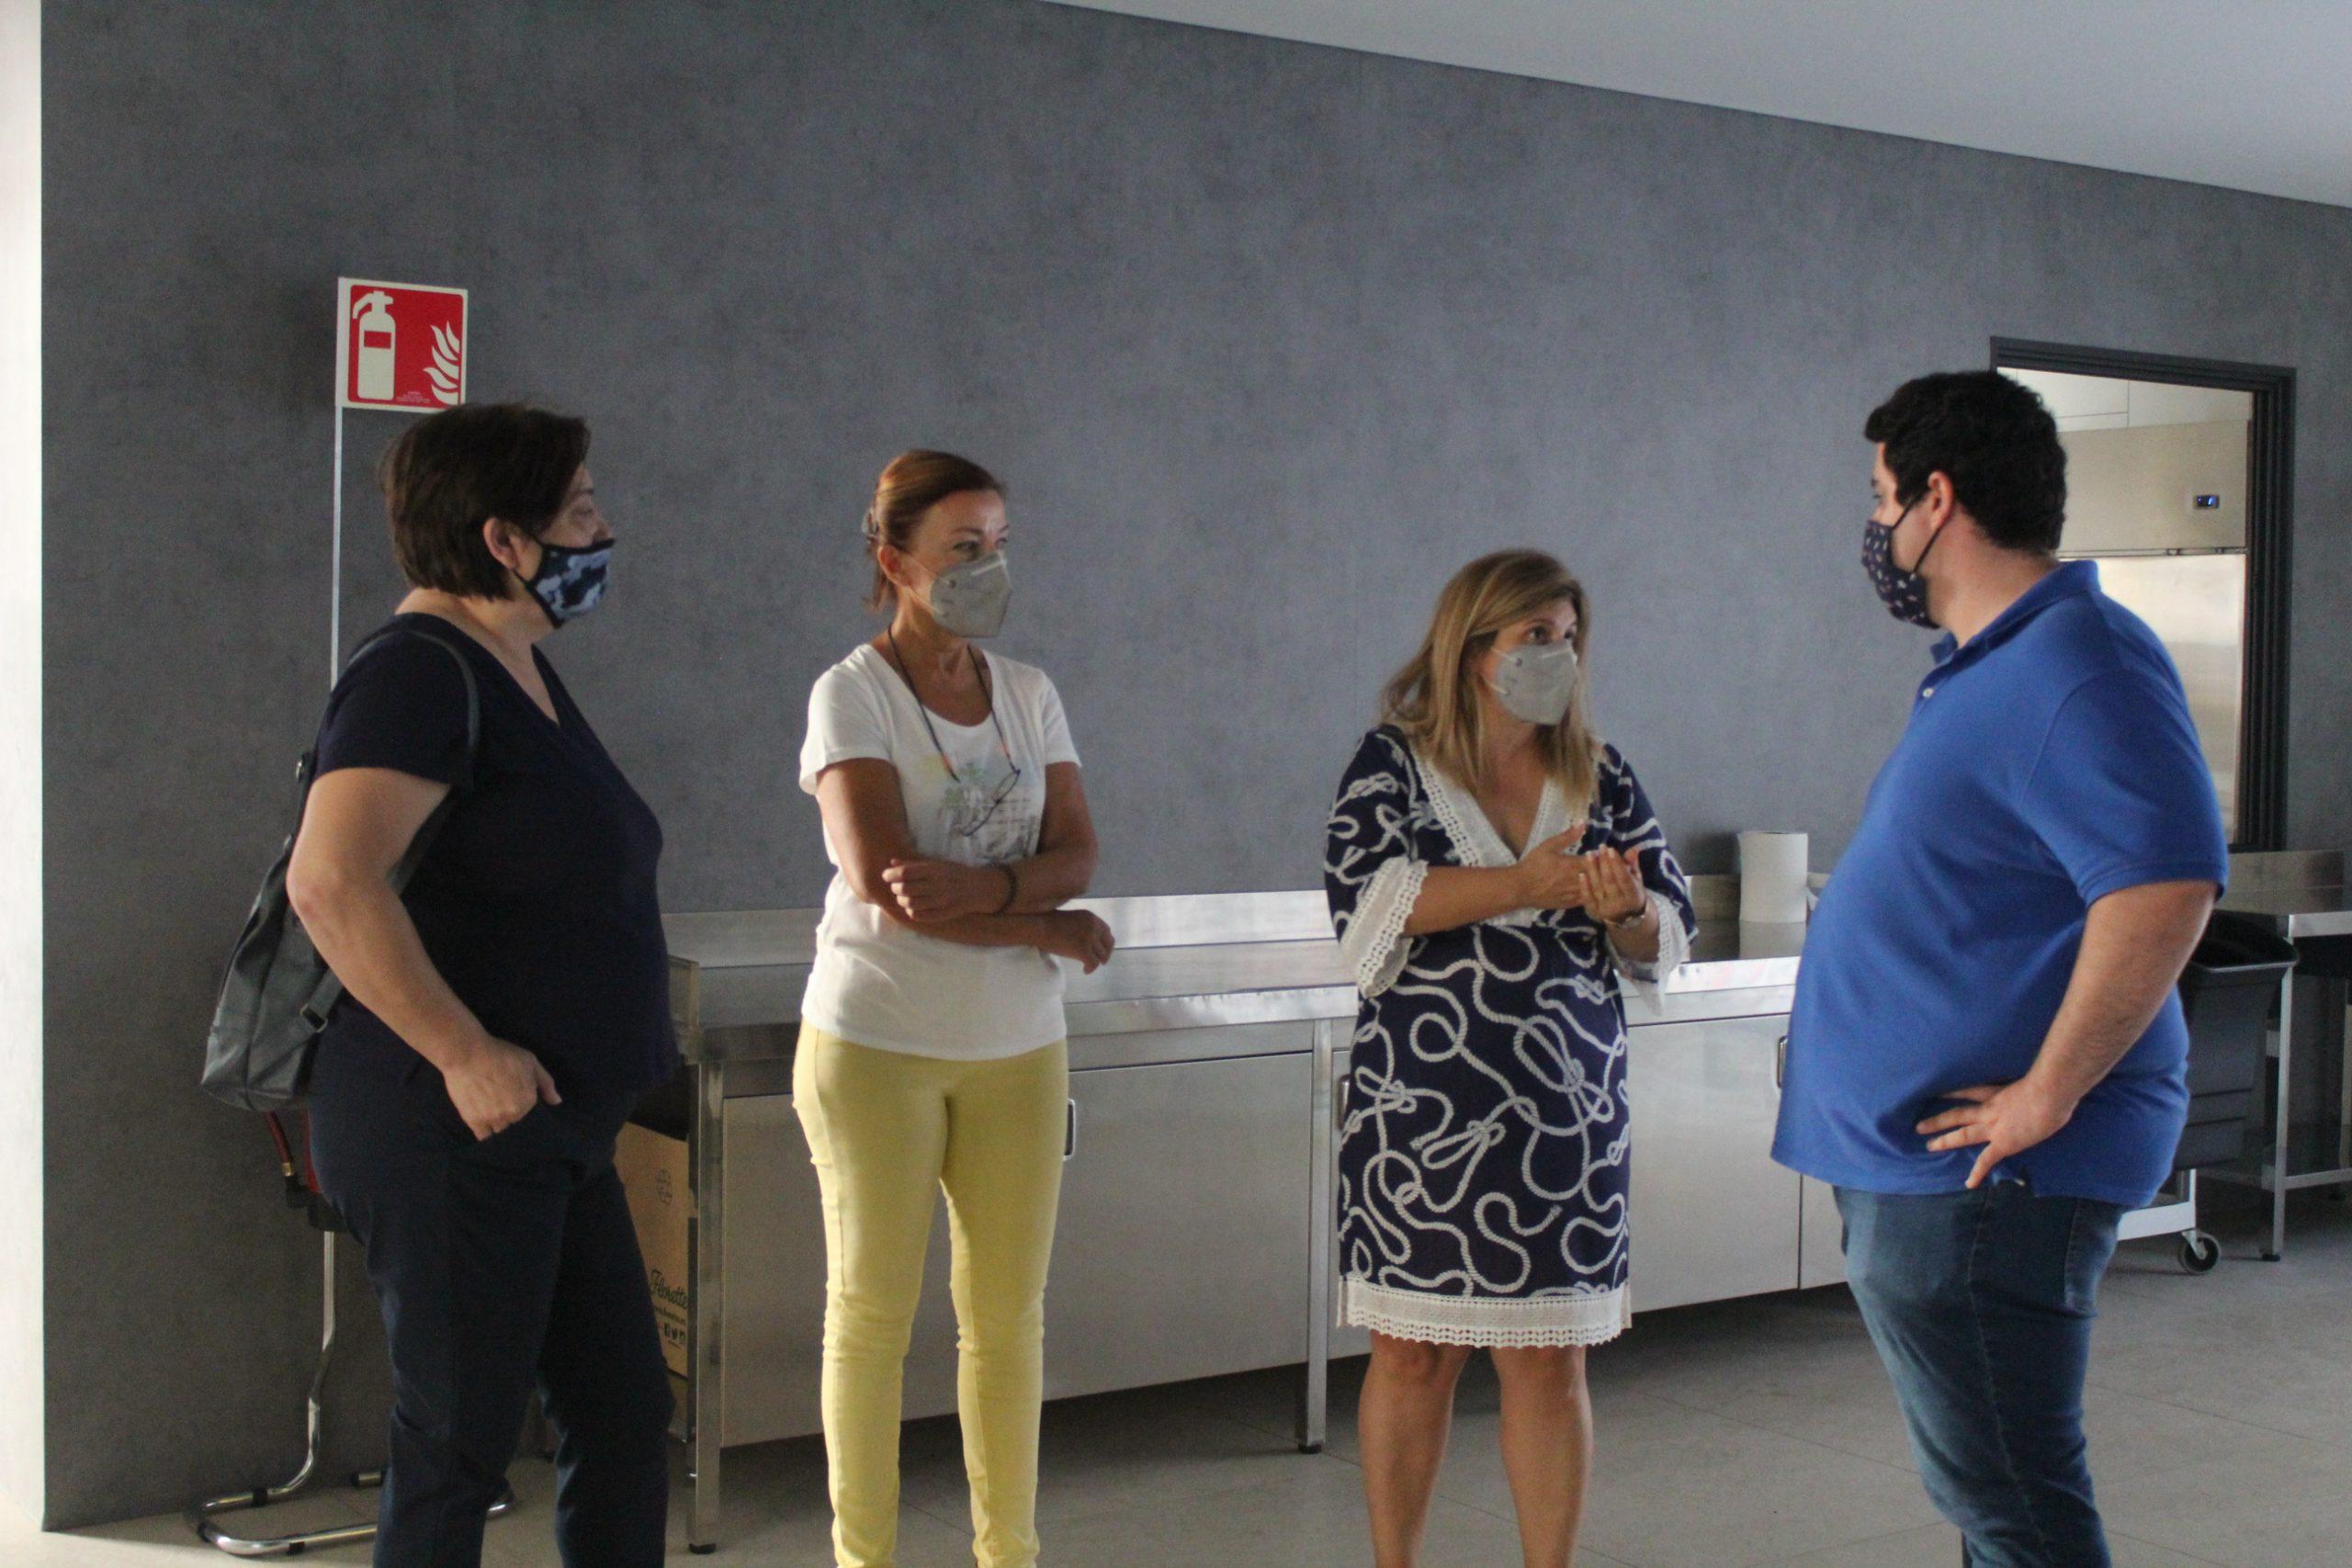 Finalizan las obras del Pla Edificant del CEIP Lope de Vega de Nules